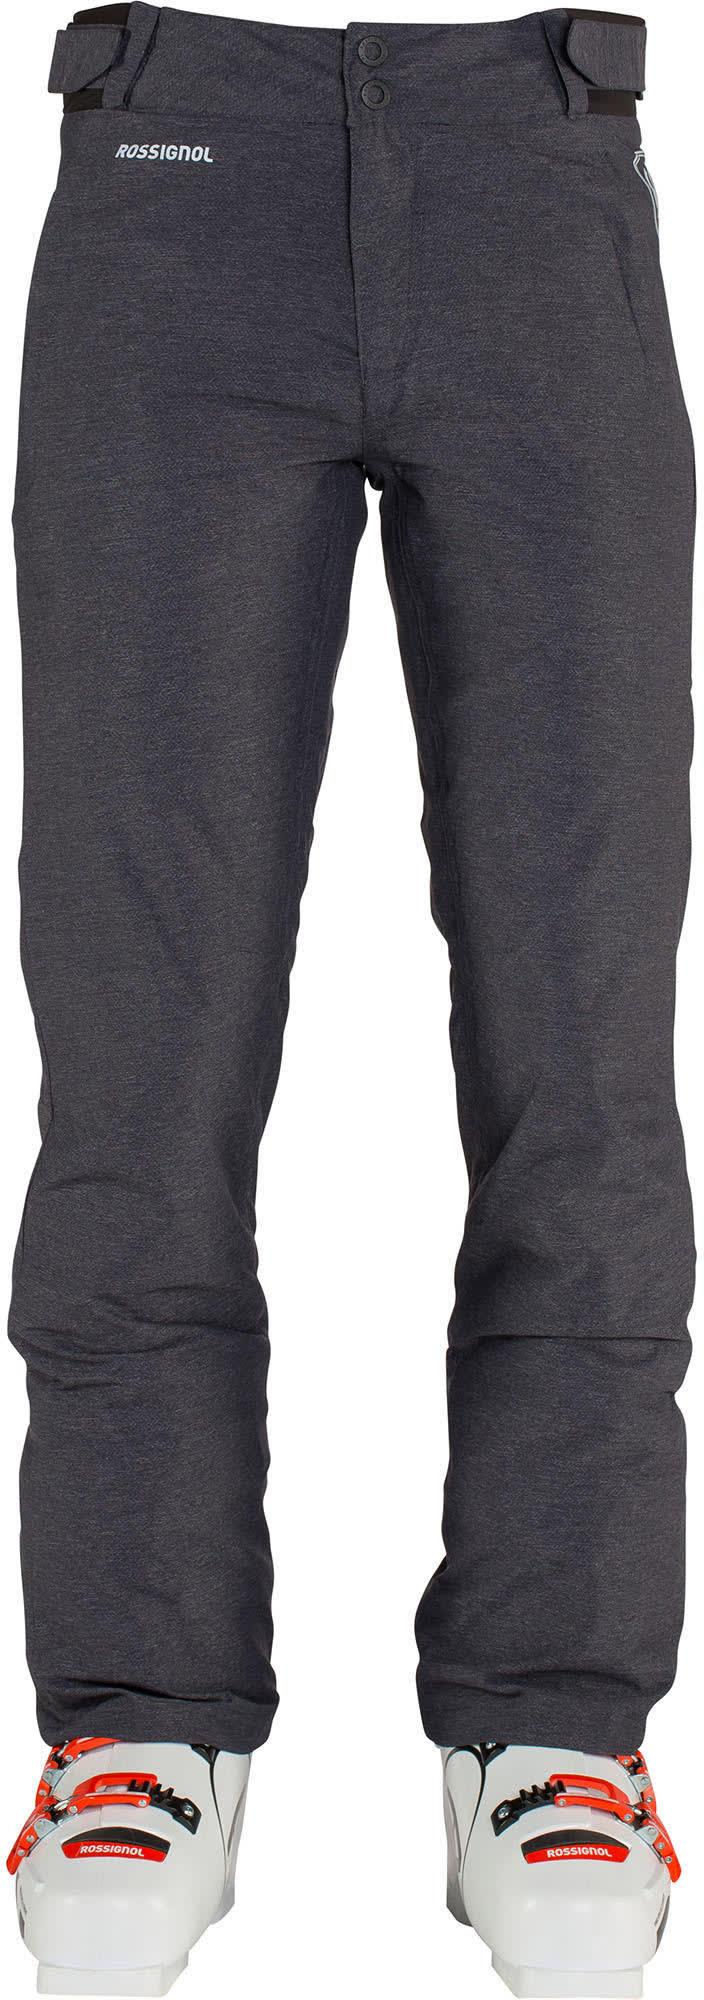 5bb01b3574 Rossignol Oxford Ski Pants - thumbnail 1